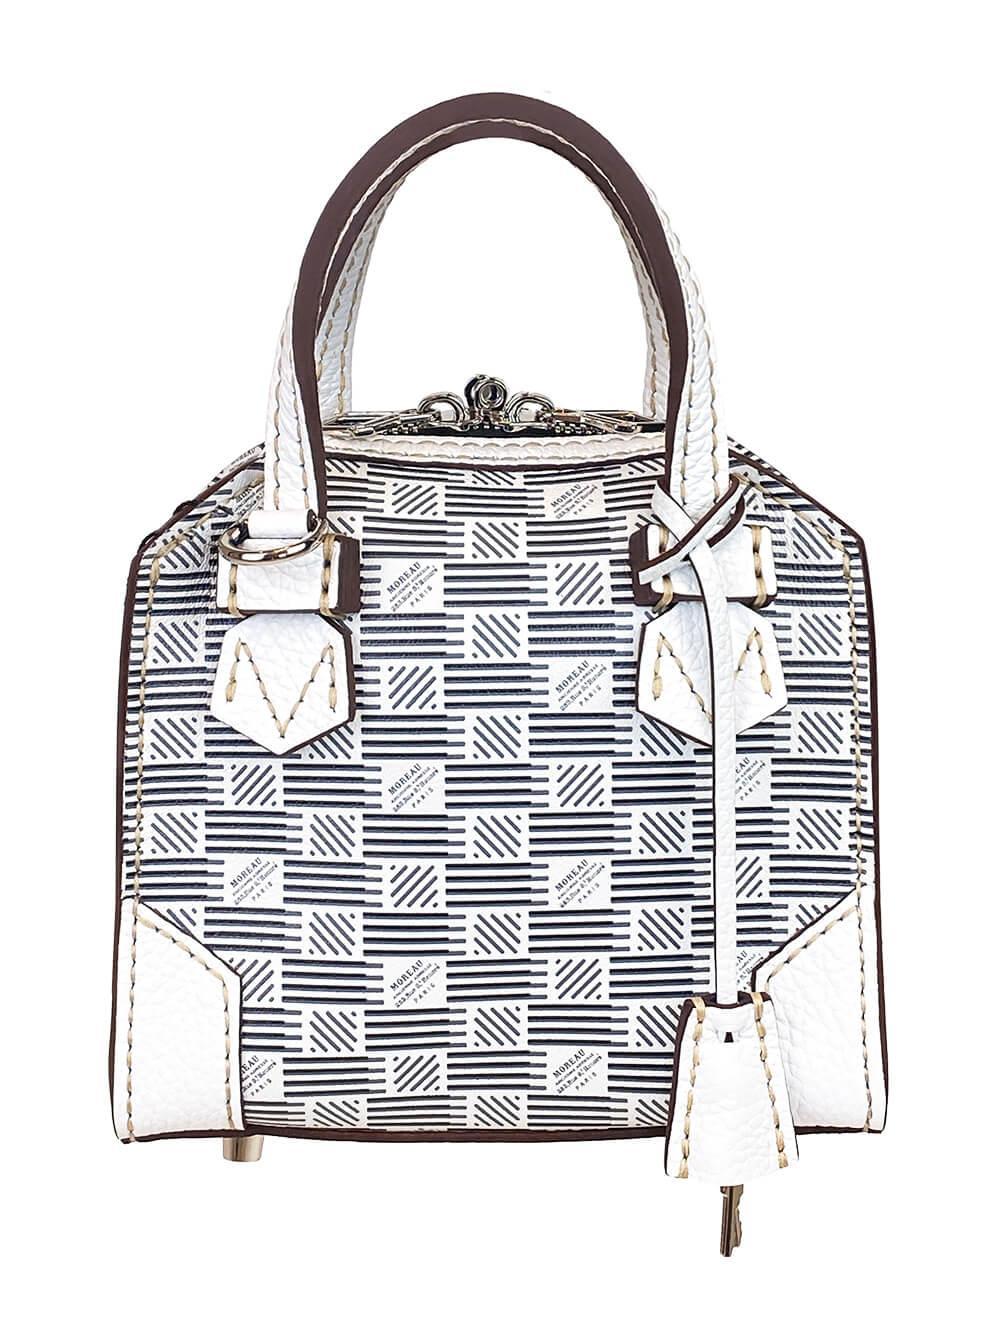 Vicomte Top Handle Bag Item # SVICBBIIVTTRSTC